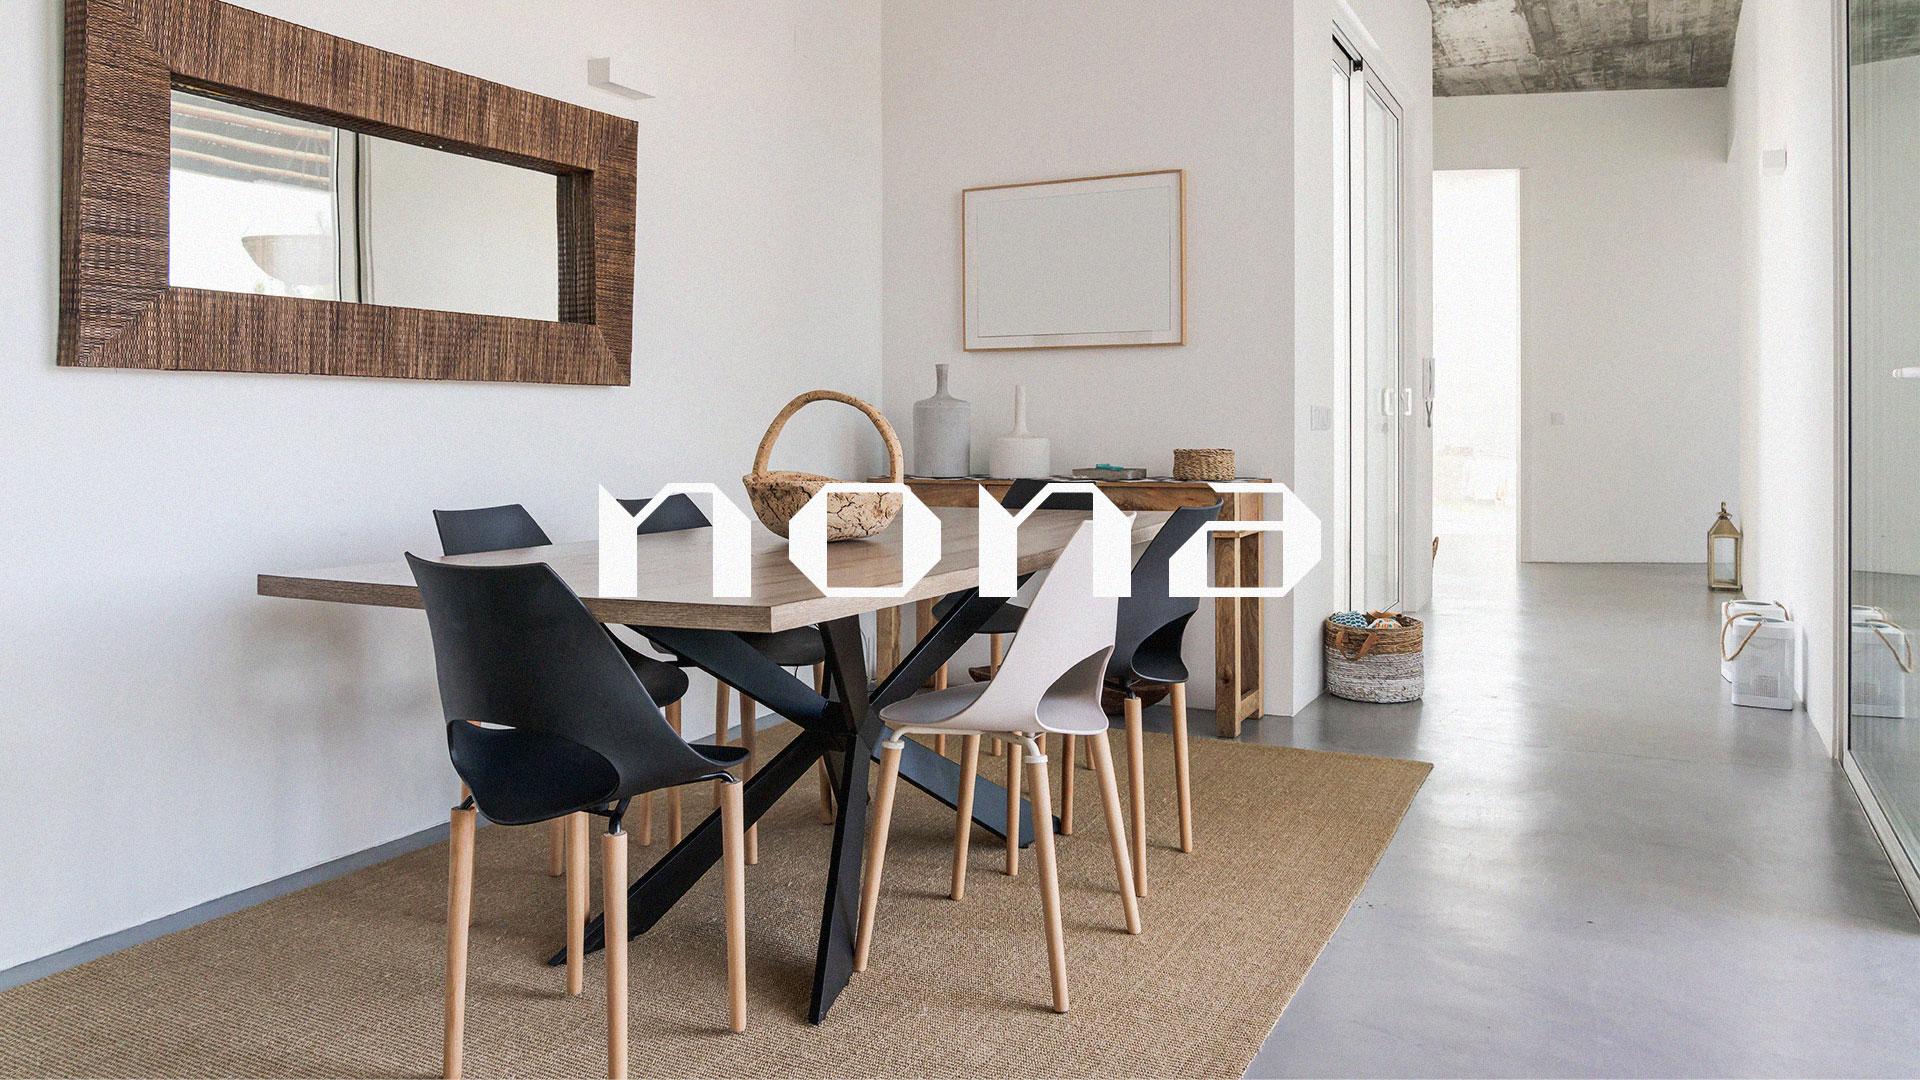 Concept Branding for a Architecture and Interiors Studio